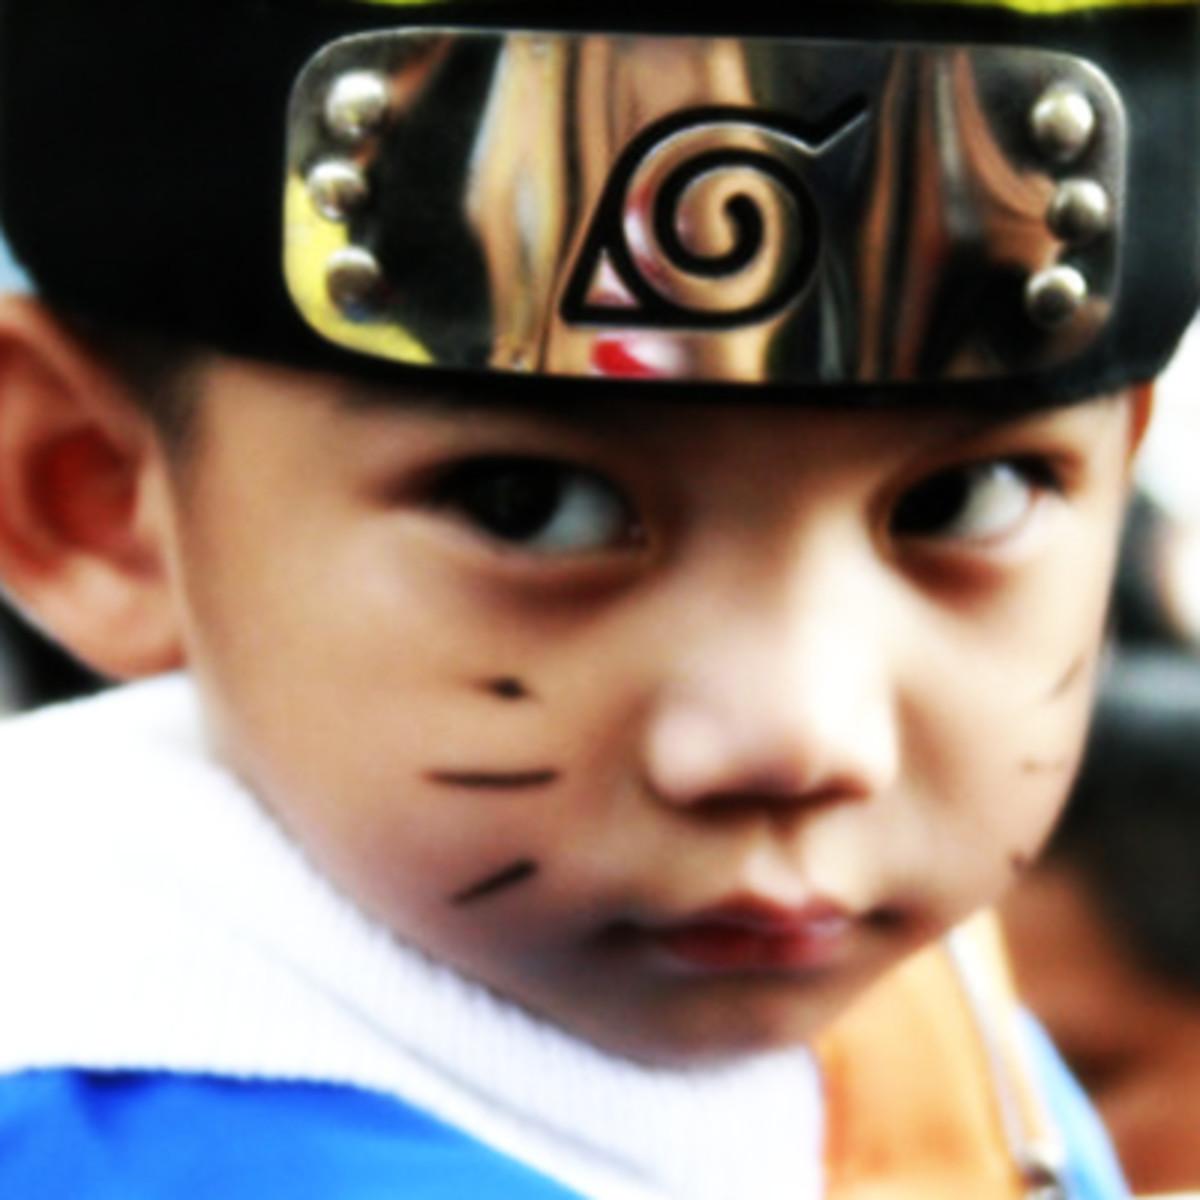 Uzumaki Naruto Kid Cosplay